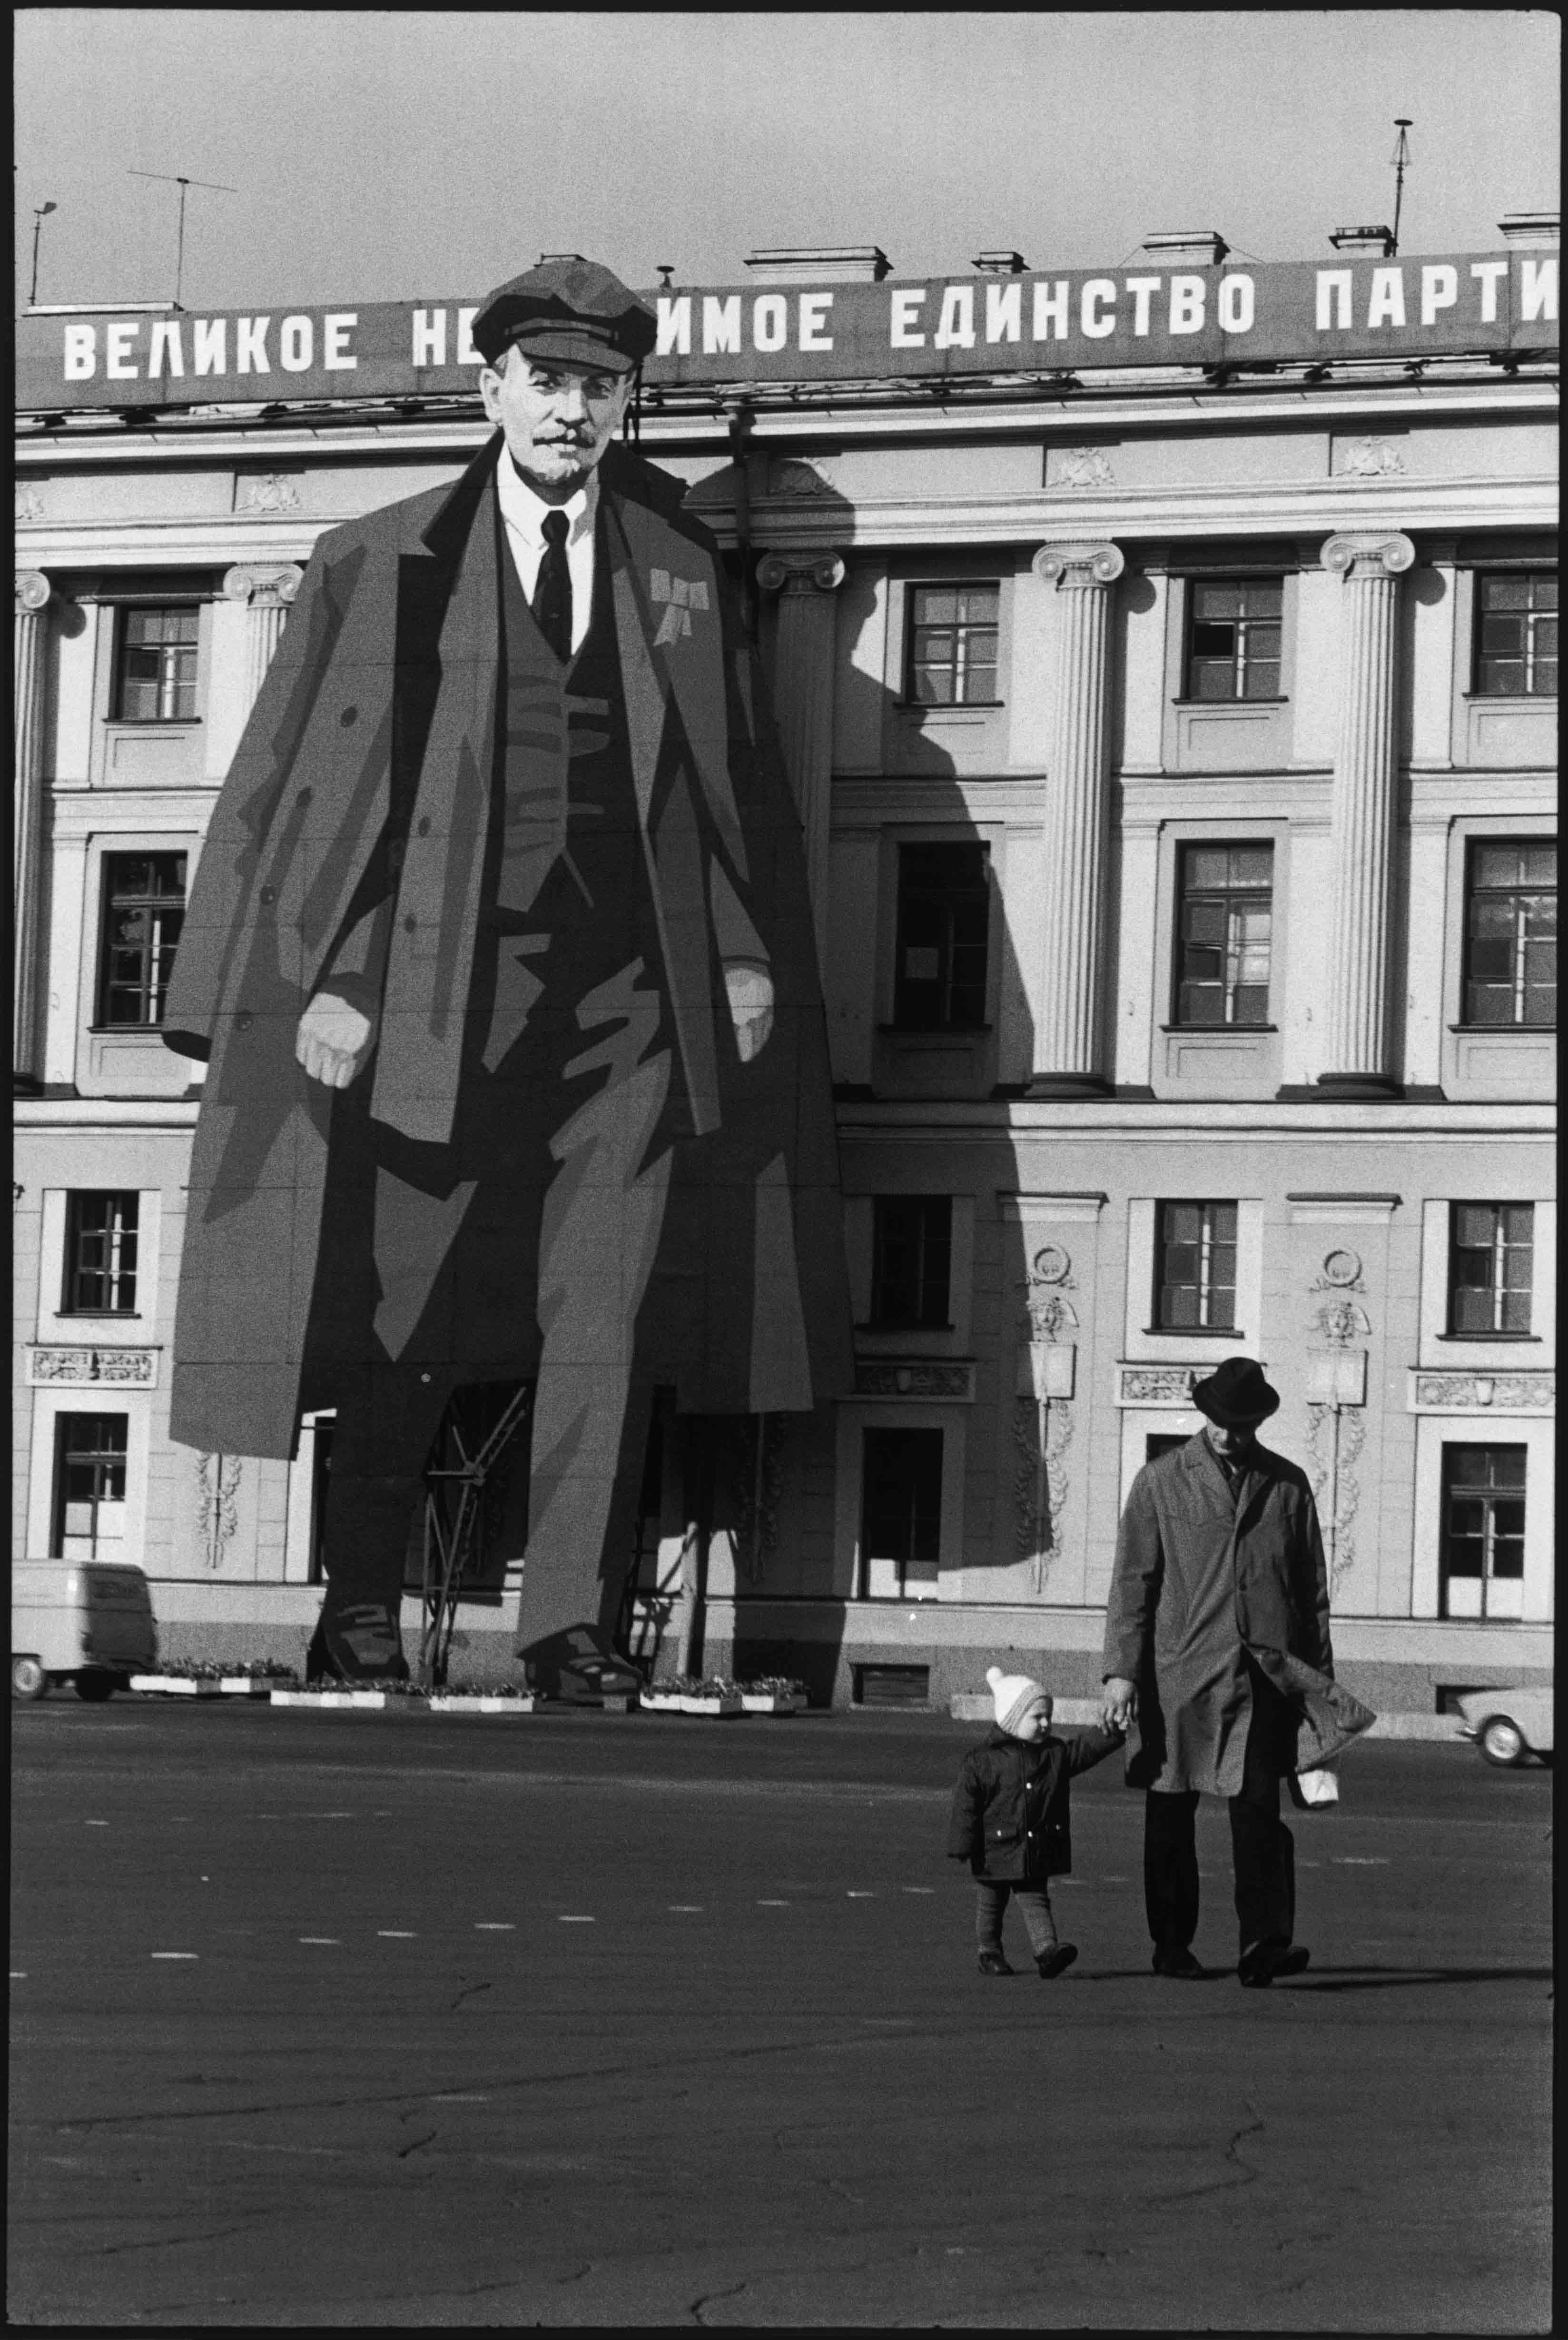 Leningrad, Russia, 1973 © Henri Cartier-Bresson / Magnum Photos